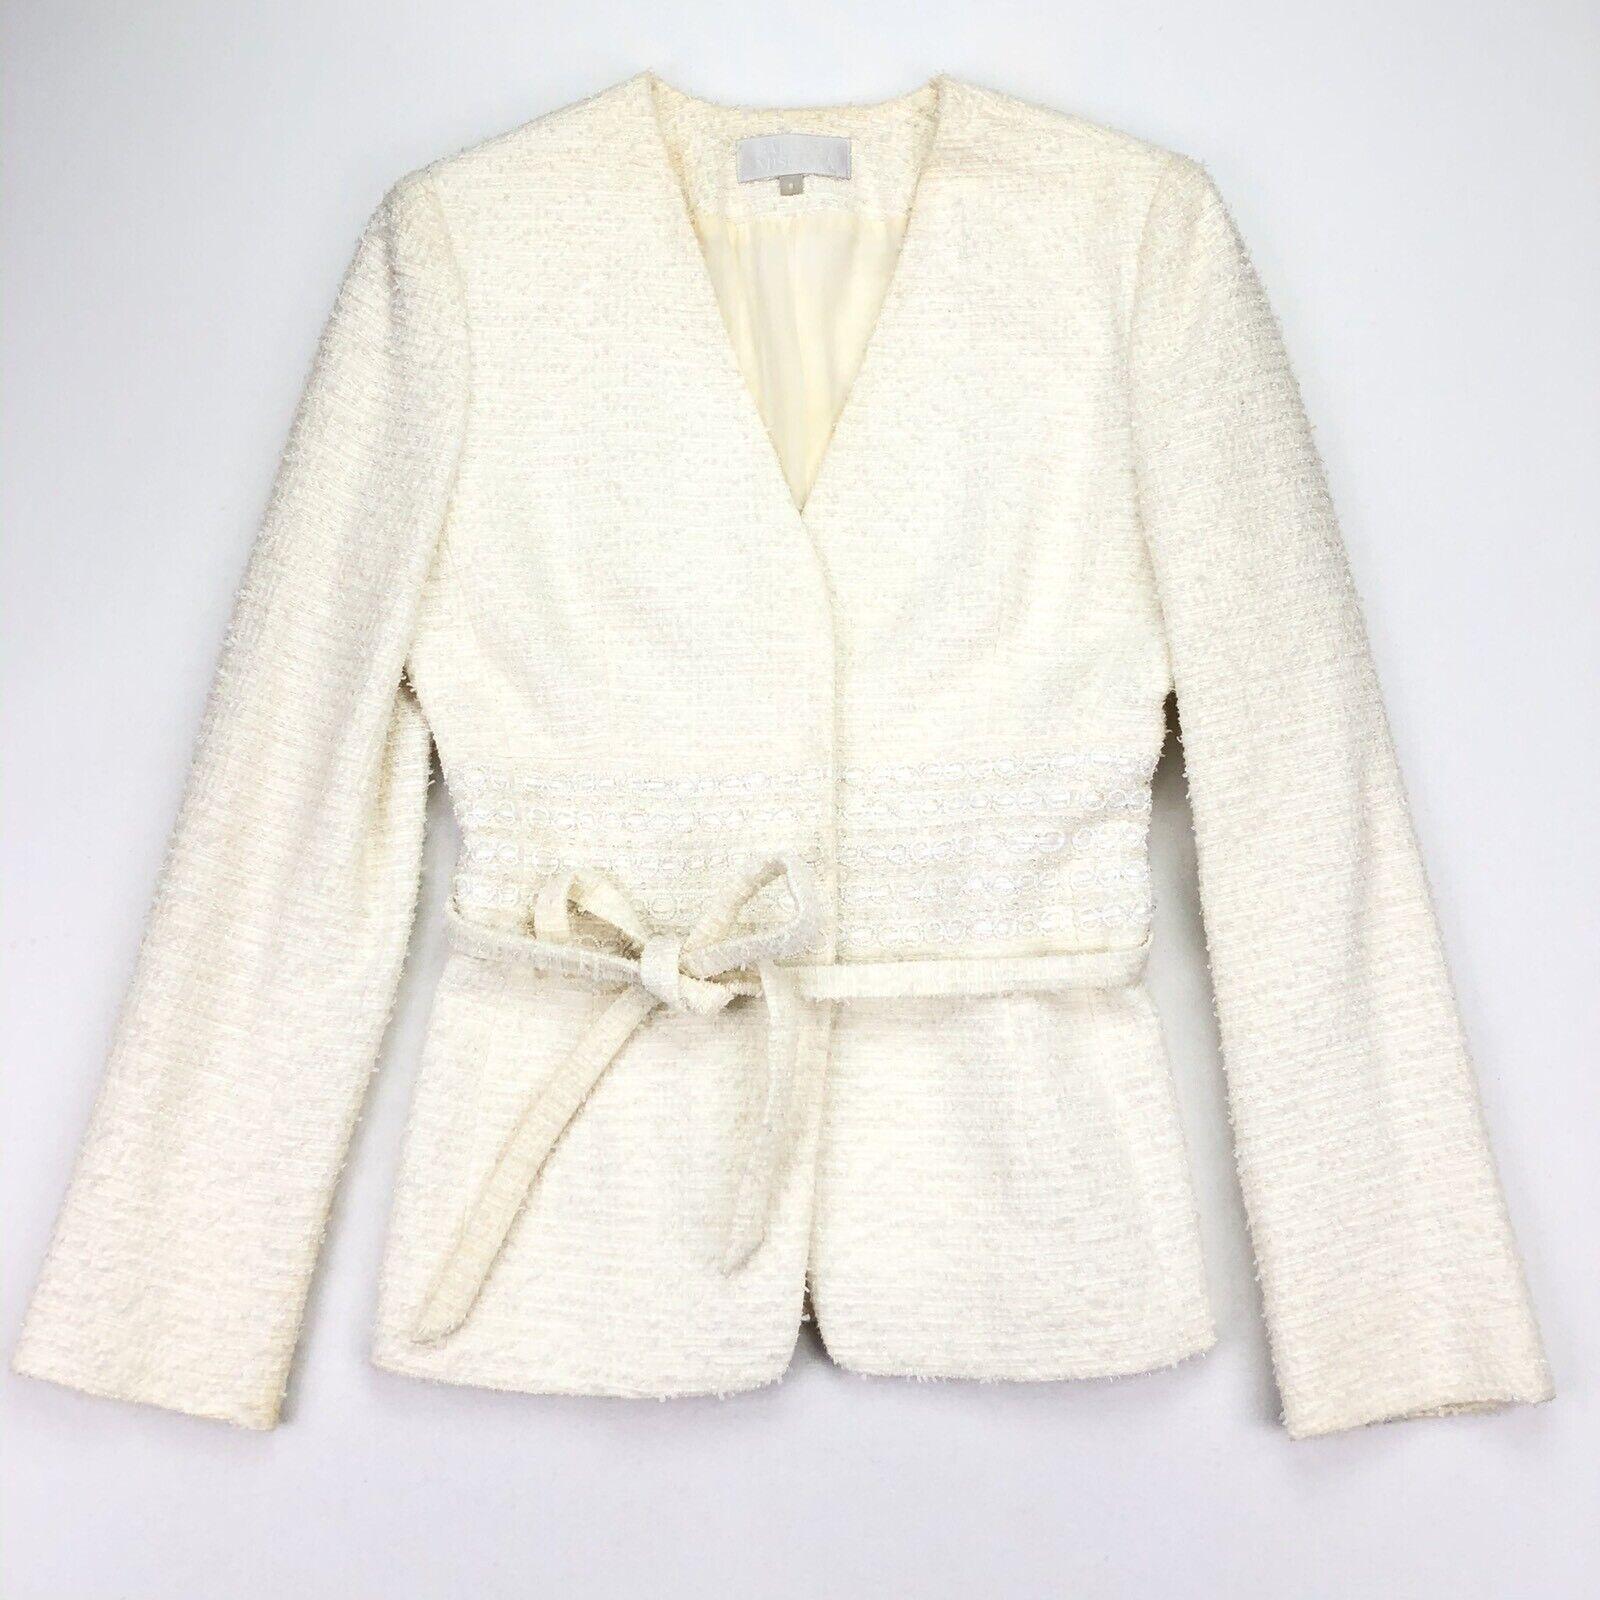 Badgley Mischka Women's Embroidered Beaded Boucle Jacket White • Size 8